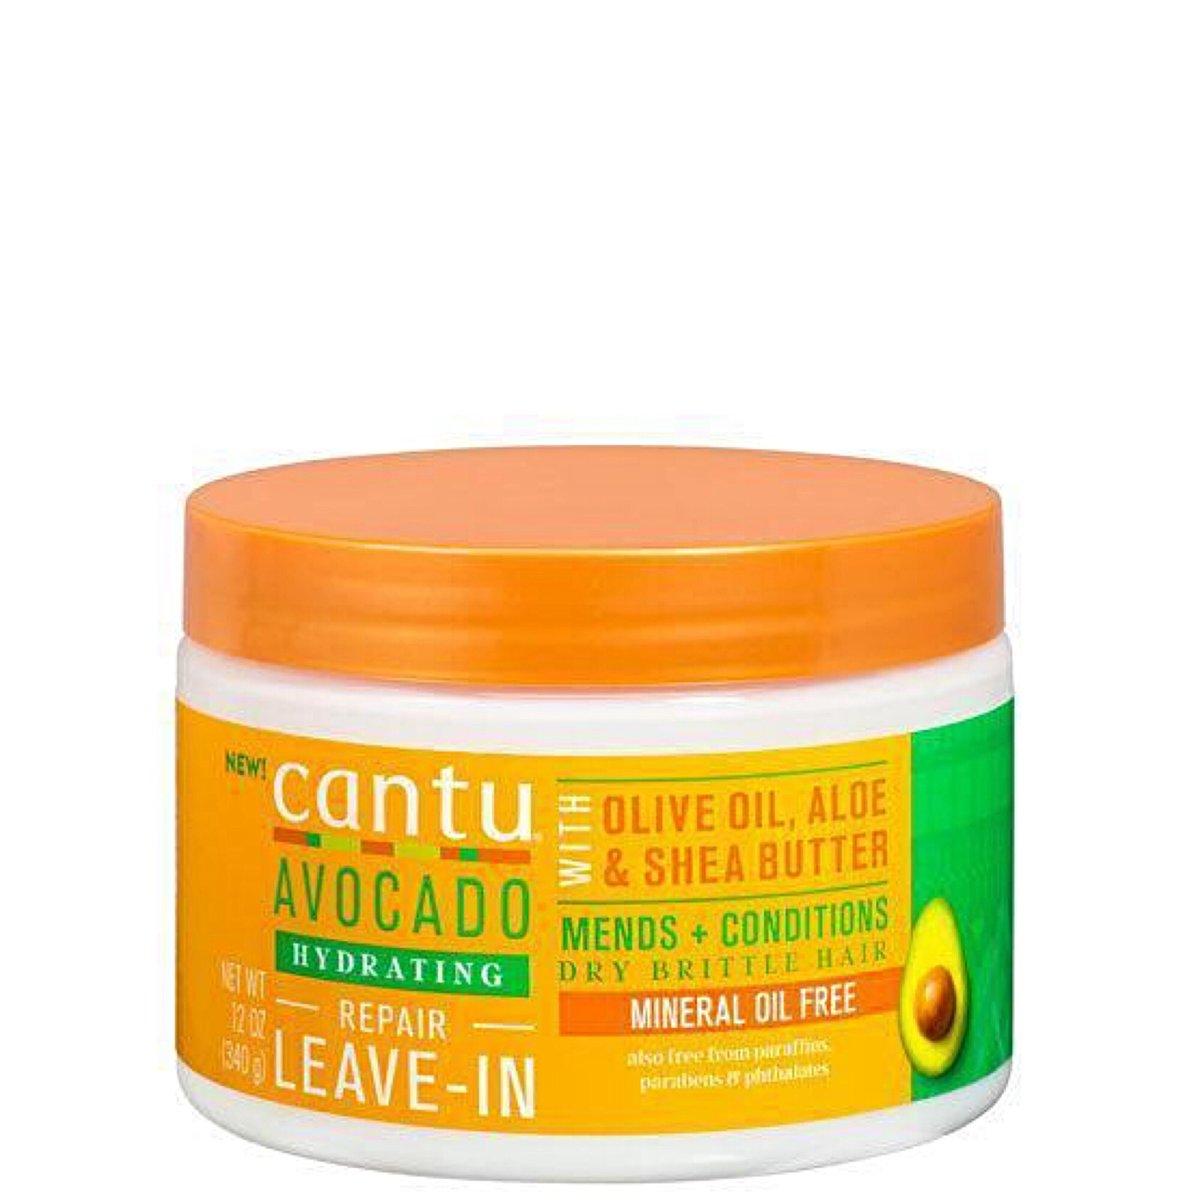 Cantu Avocado Hydrating Repair Leave-In 12oz